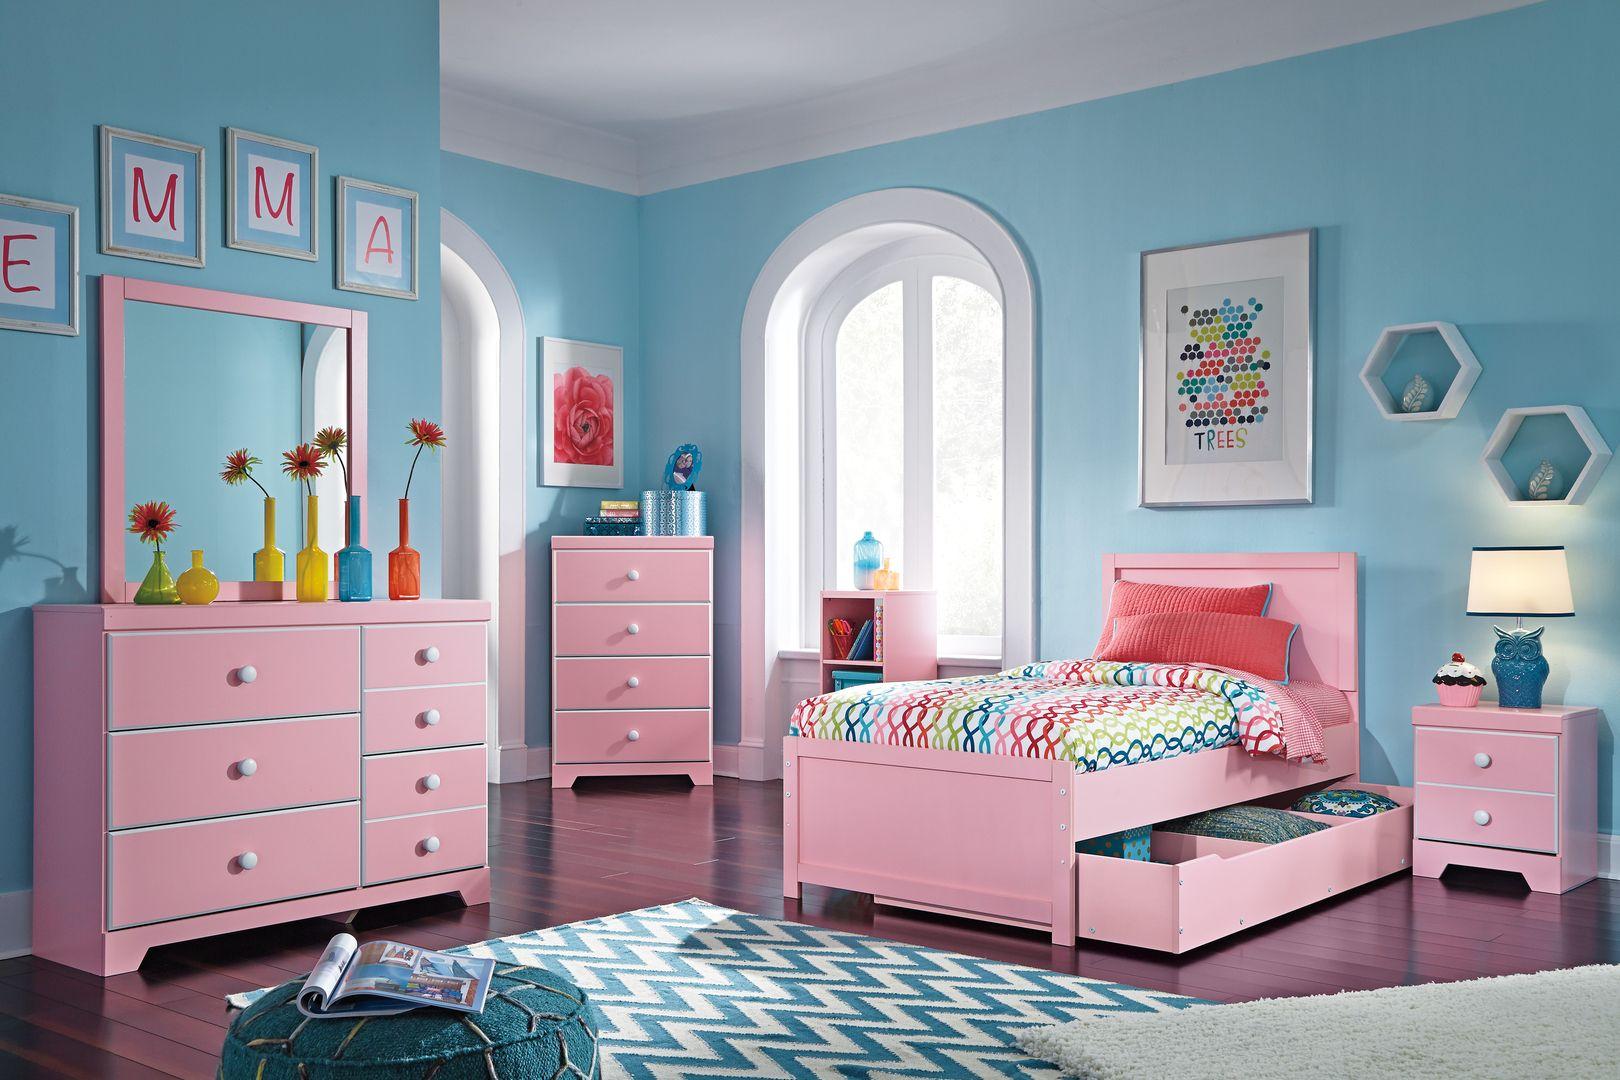 kamar tidur anak perempuan set lengkap warna pink, set kamar anak